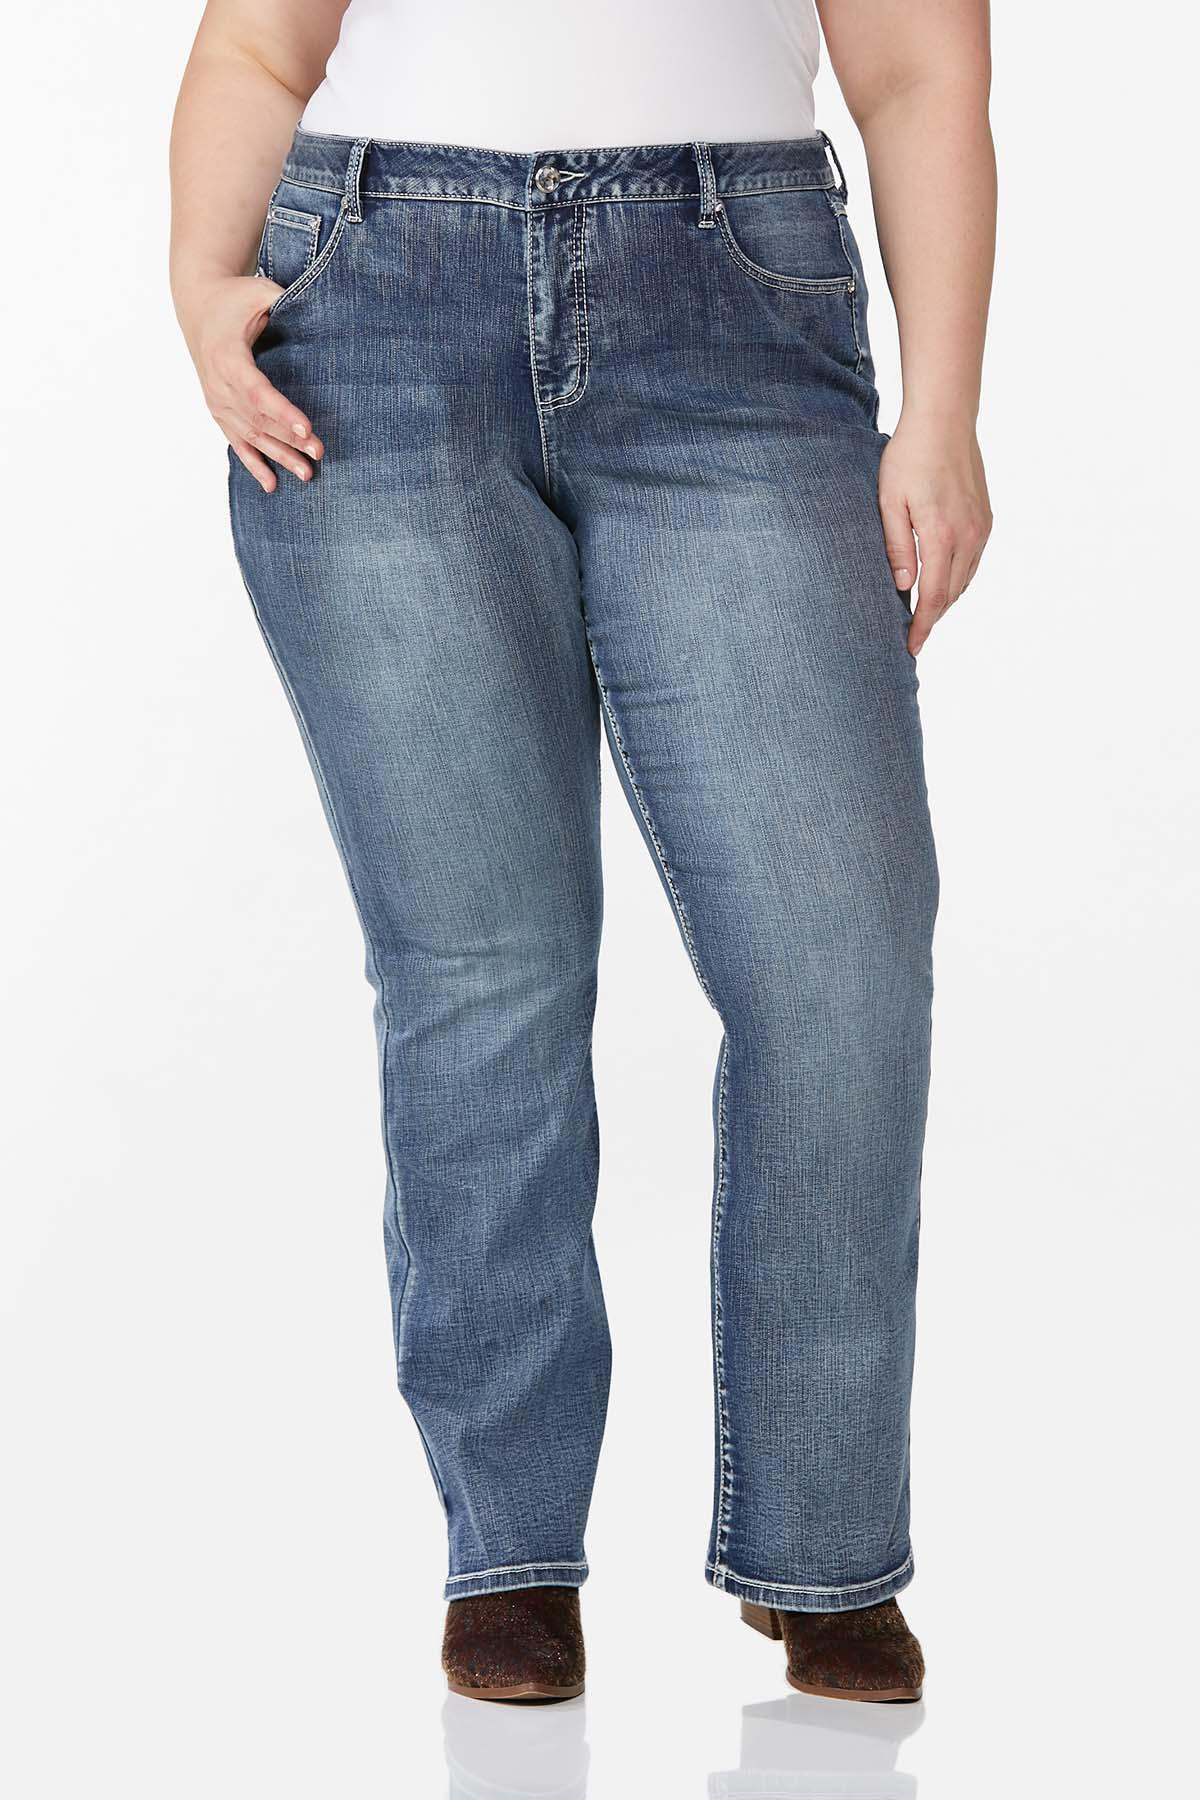 Plus Size Stone Leopard Pocket Jeans (Item #44709693)